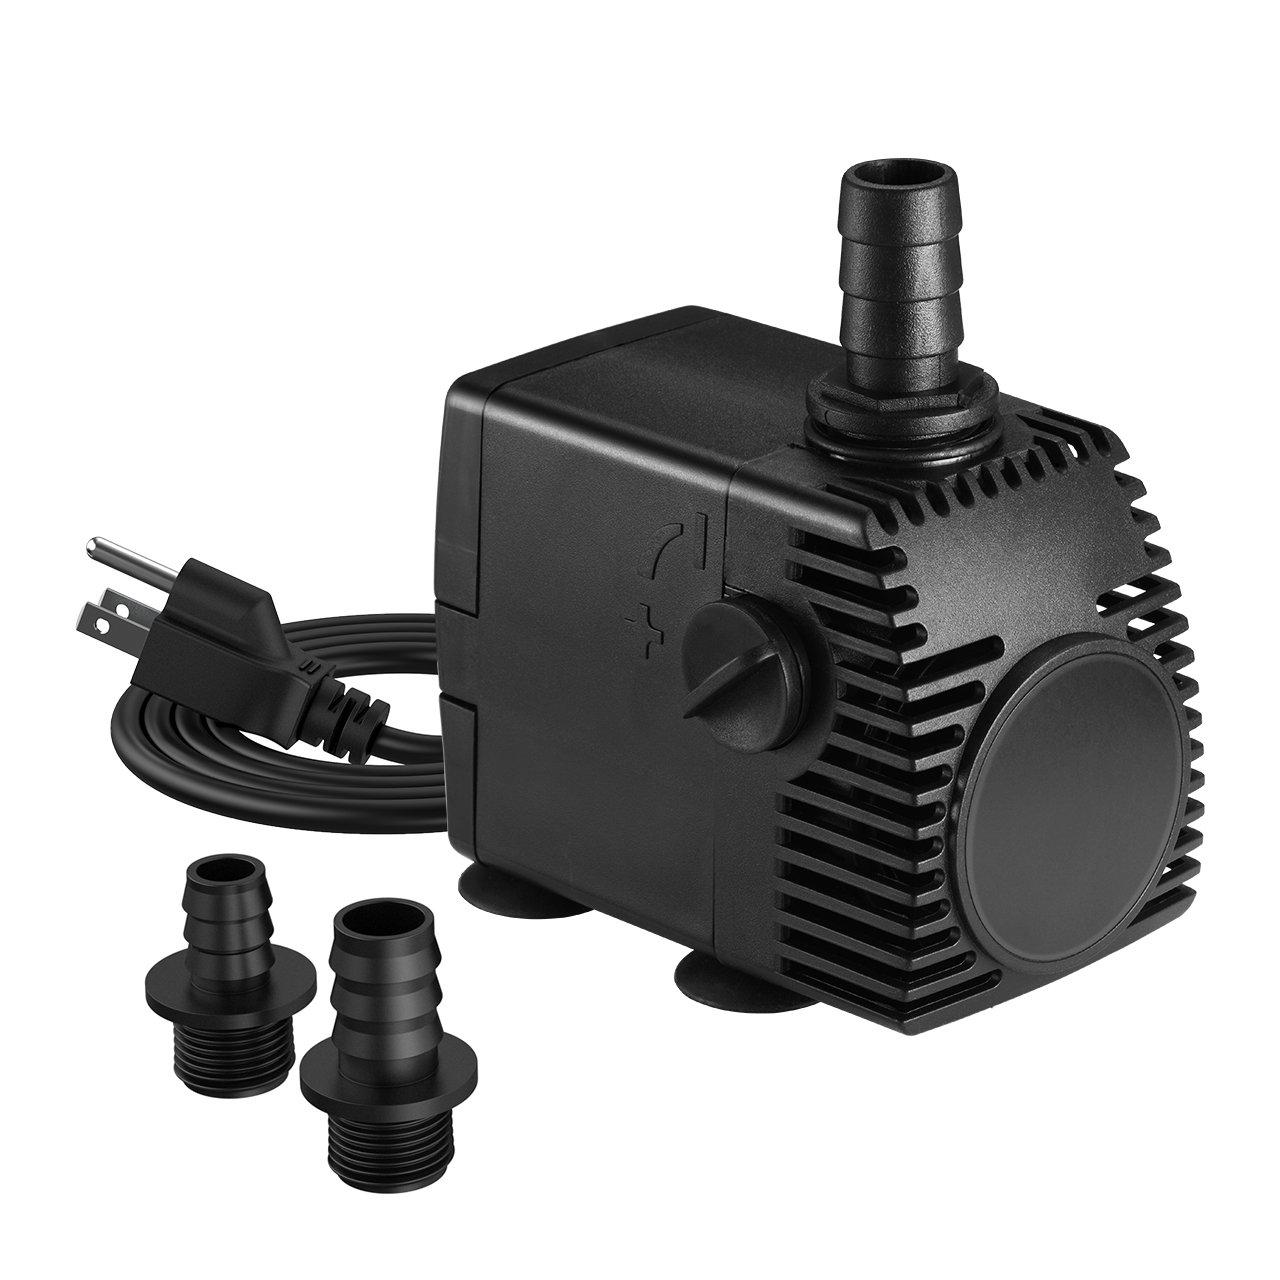 Sewage/Effluent Pumps | Amazon.com | Rough Plumbing - Sewage